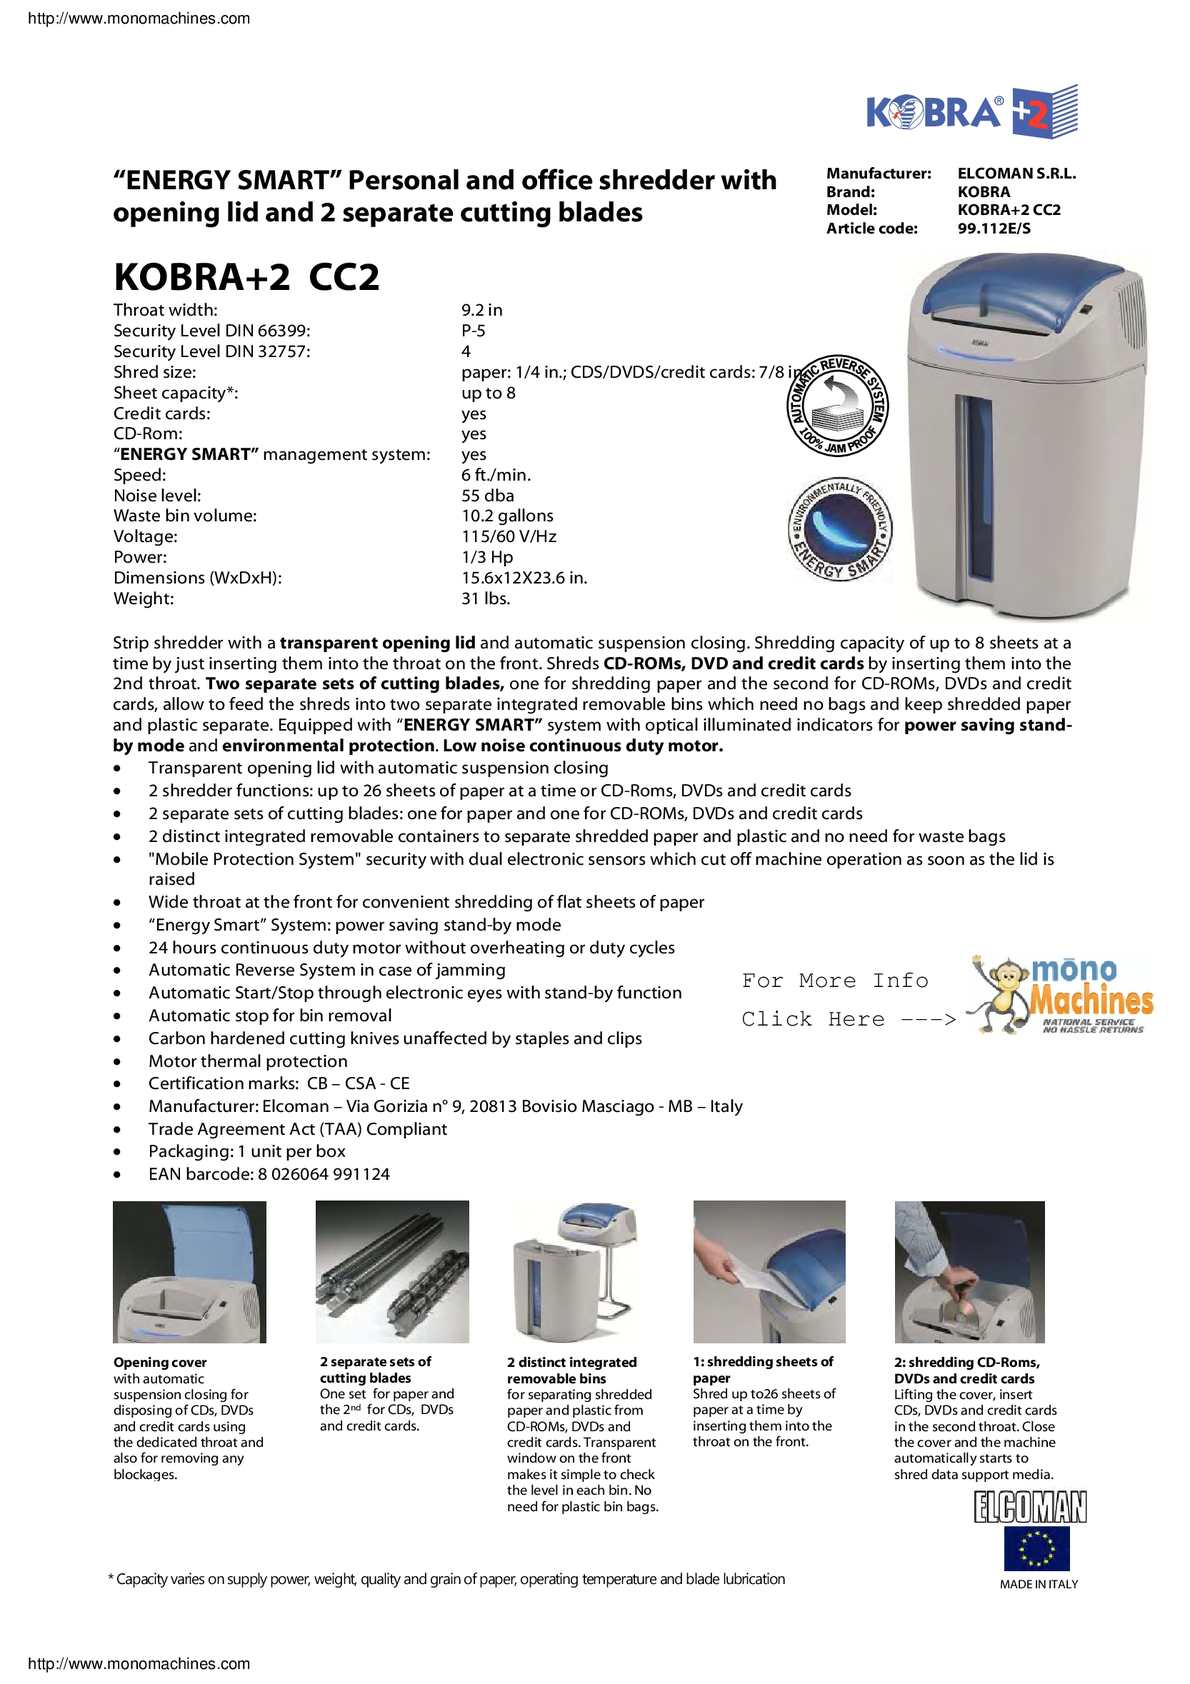 Calaméo - Kobra +2 CC2 Professional Small Offices Cross-Cut Shredder